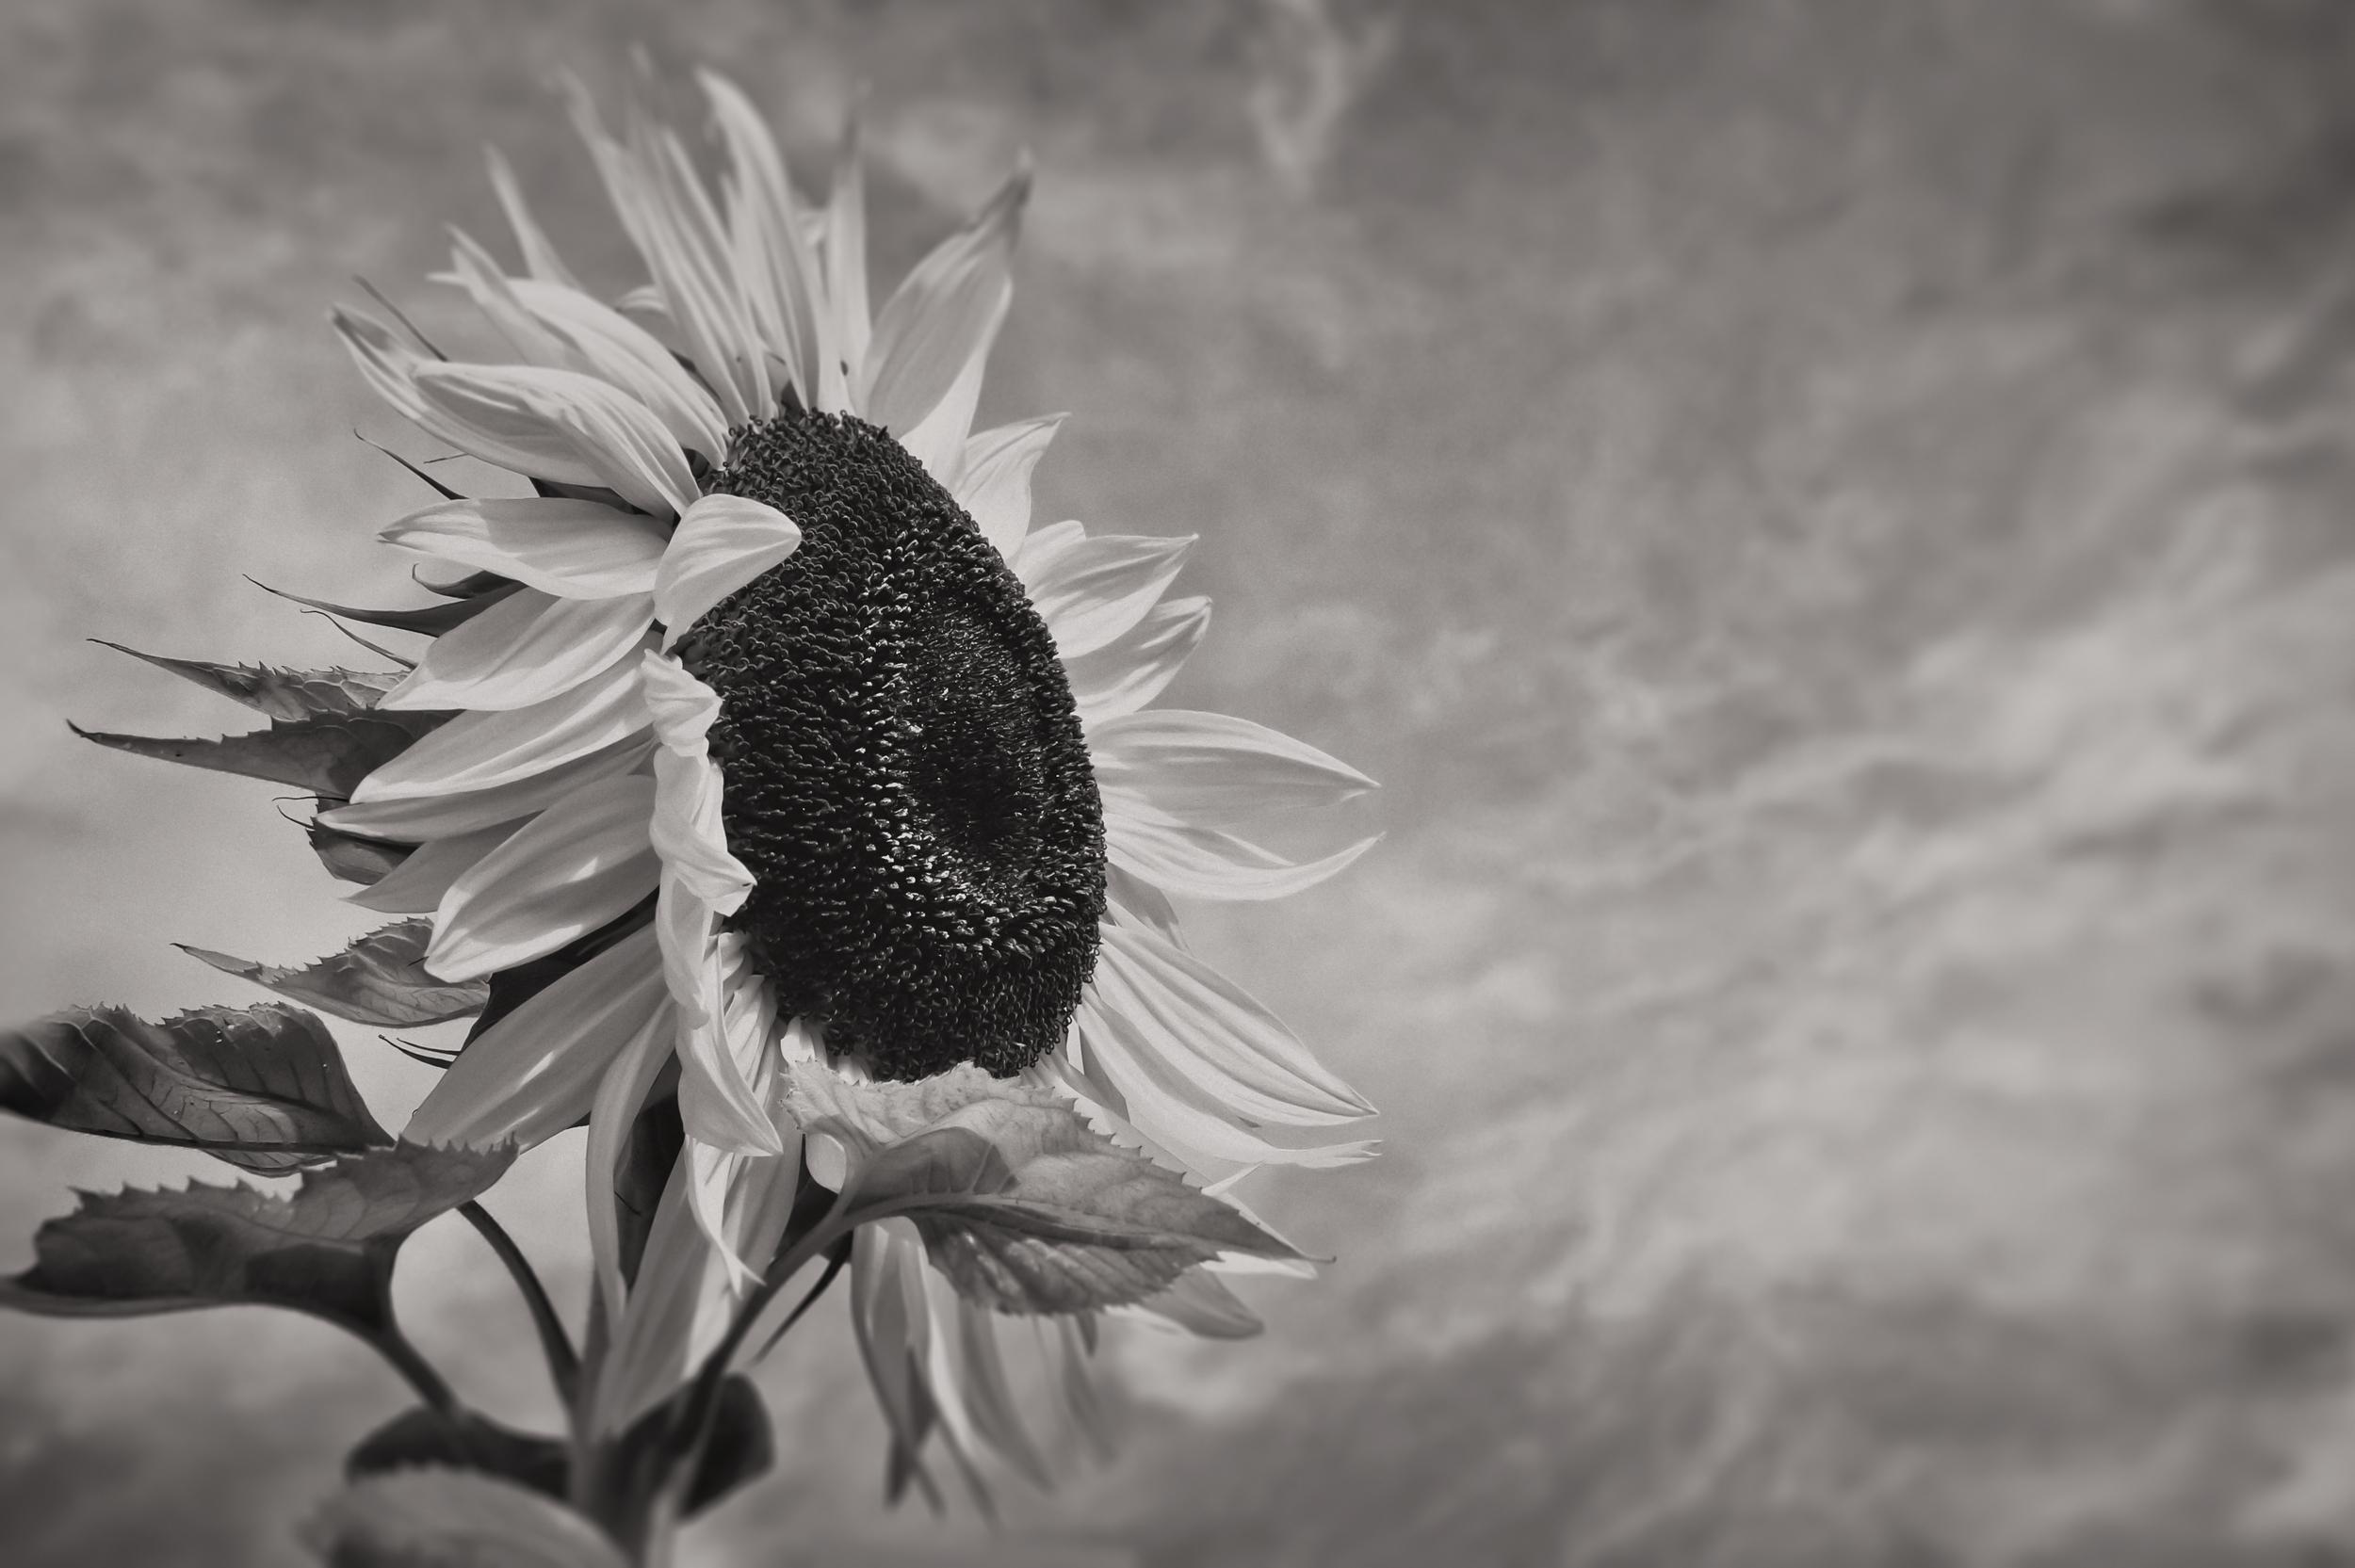 Sunflower   North Brookfield, N.Y.